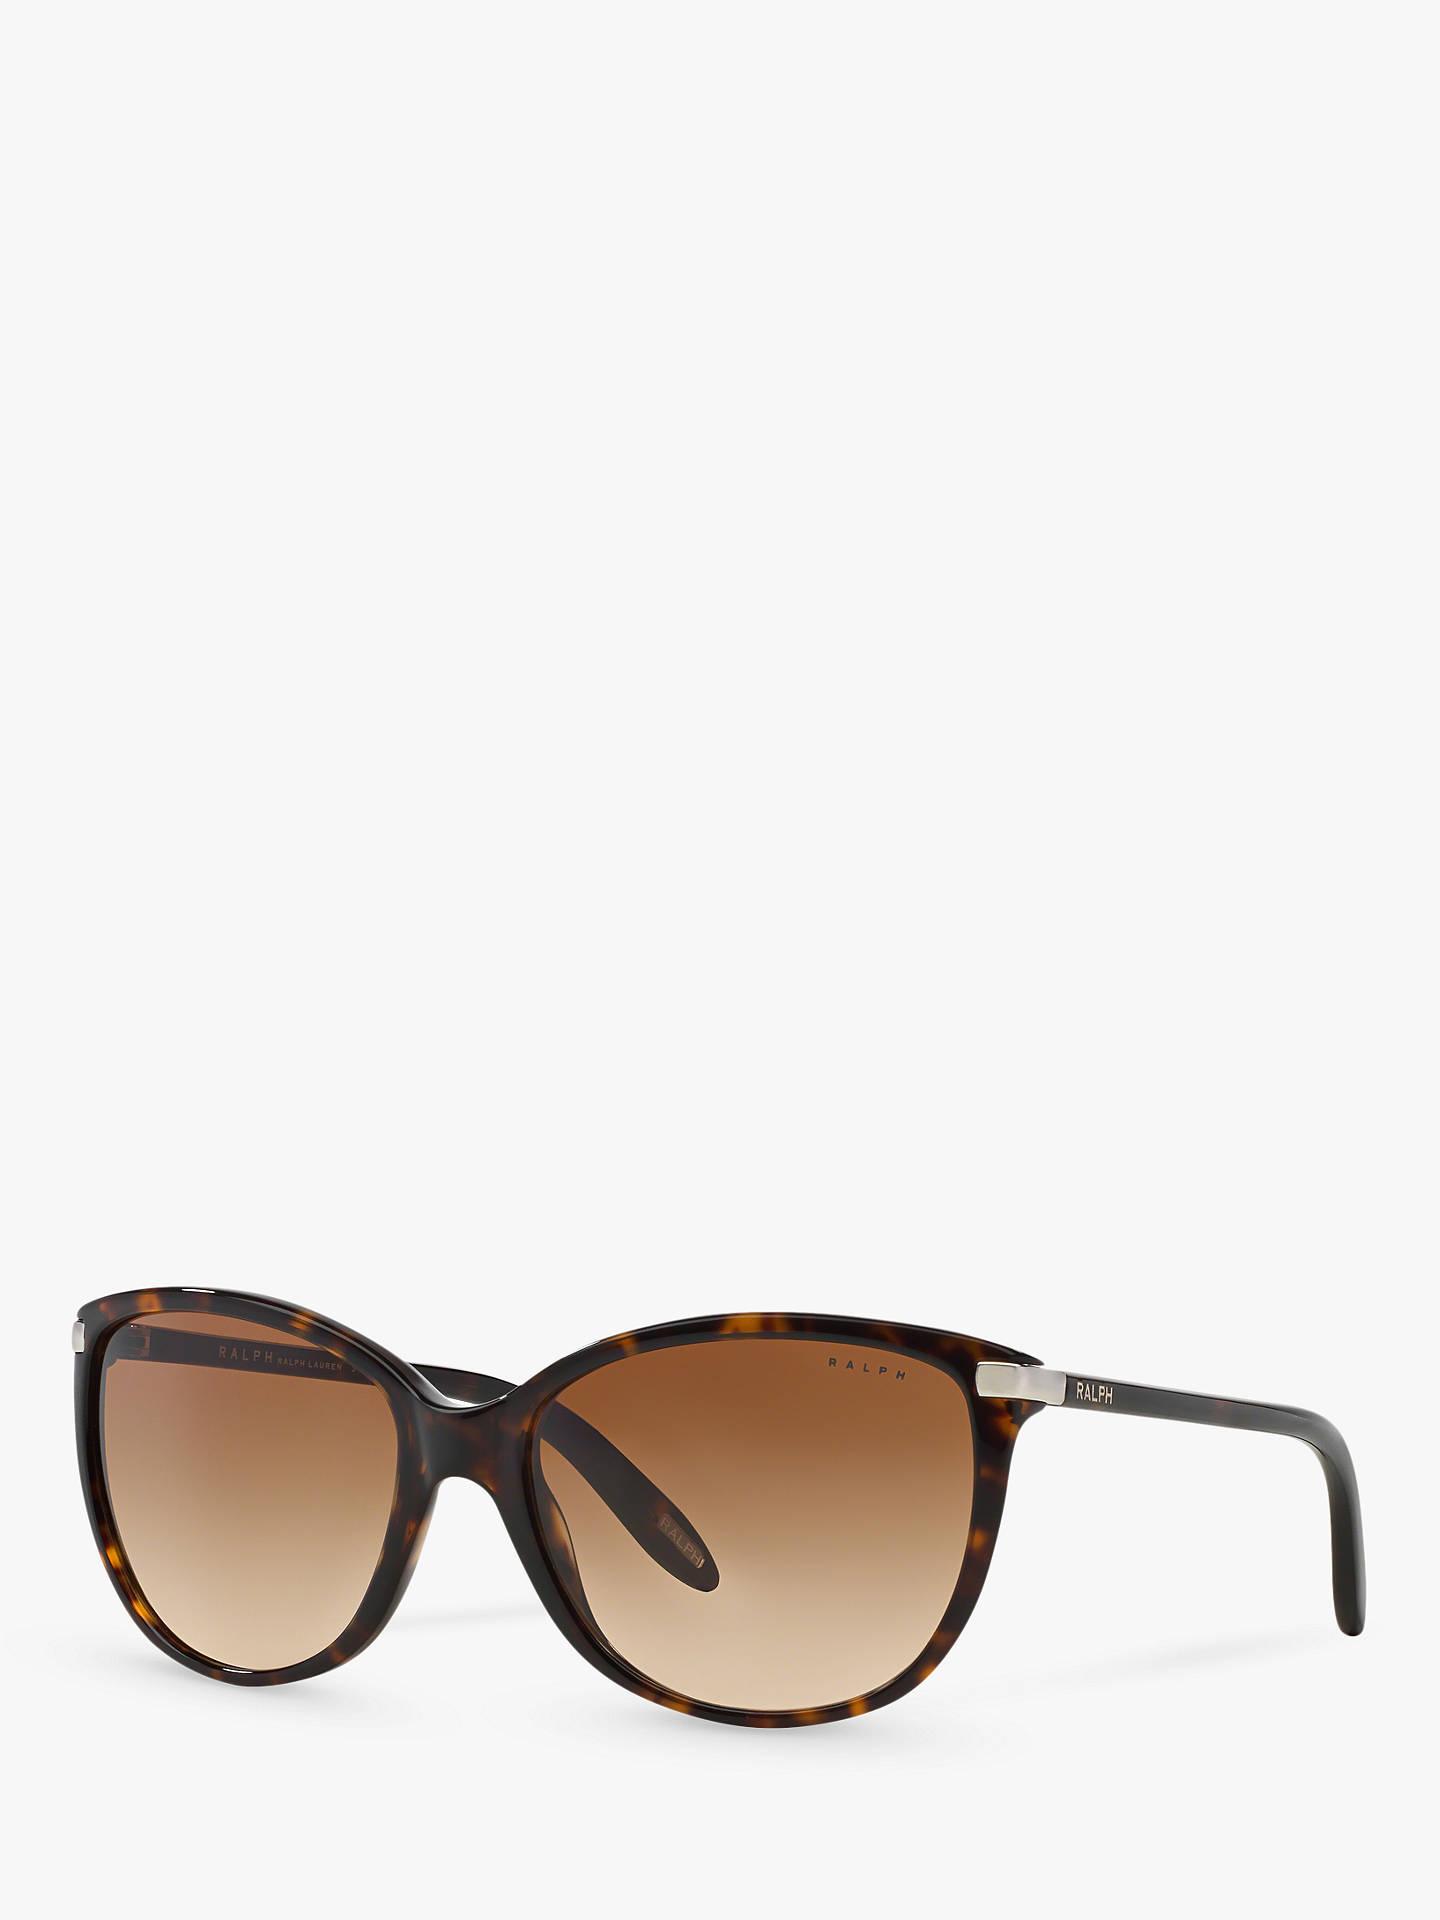 d1bfa94f8d BuyPolo Ralph Lauren RA5160 Women s Cat s Eye Sunglasses